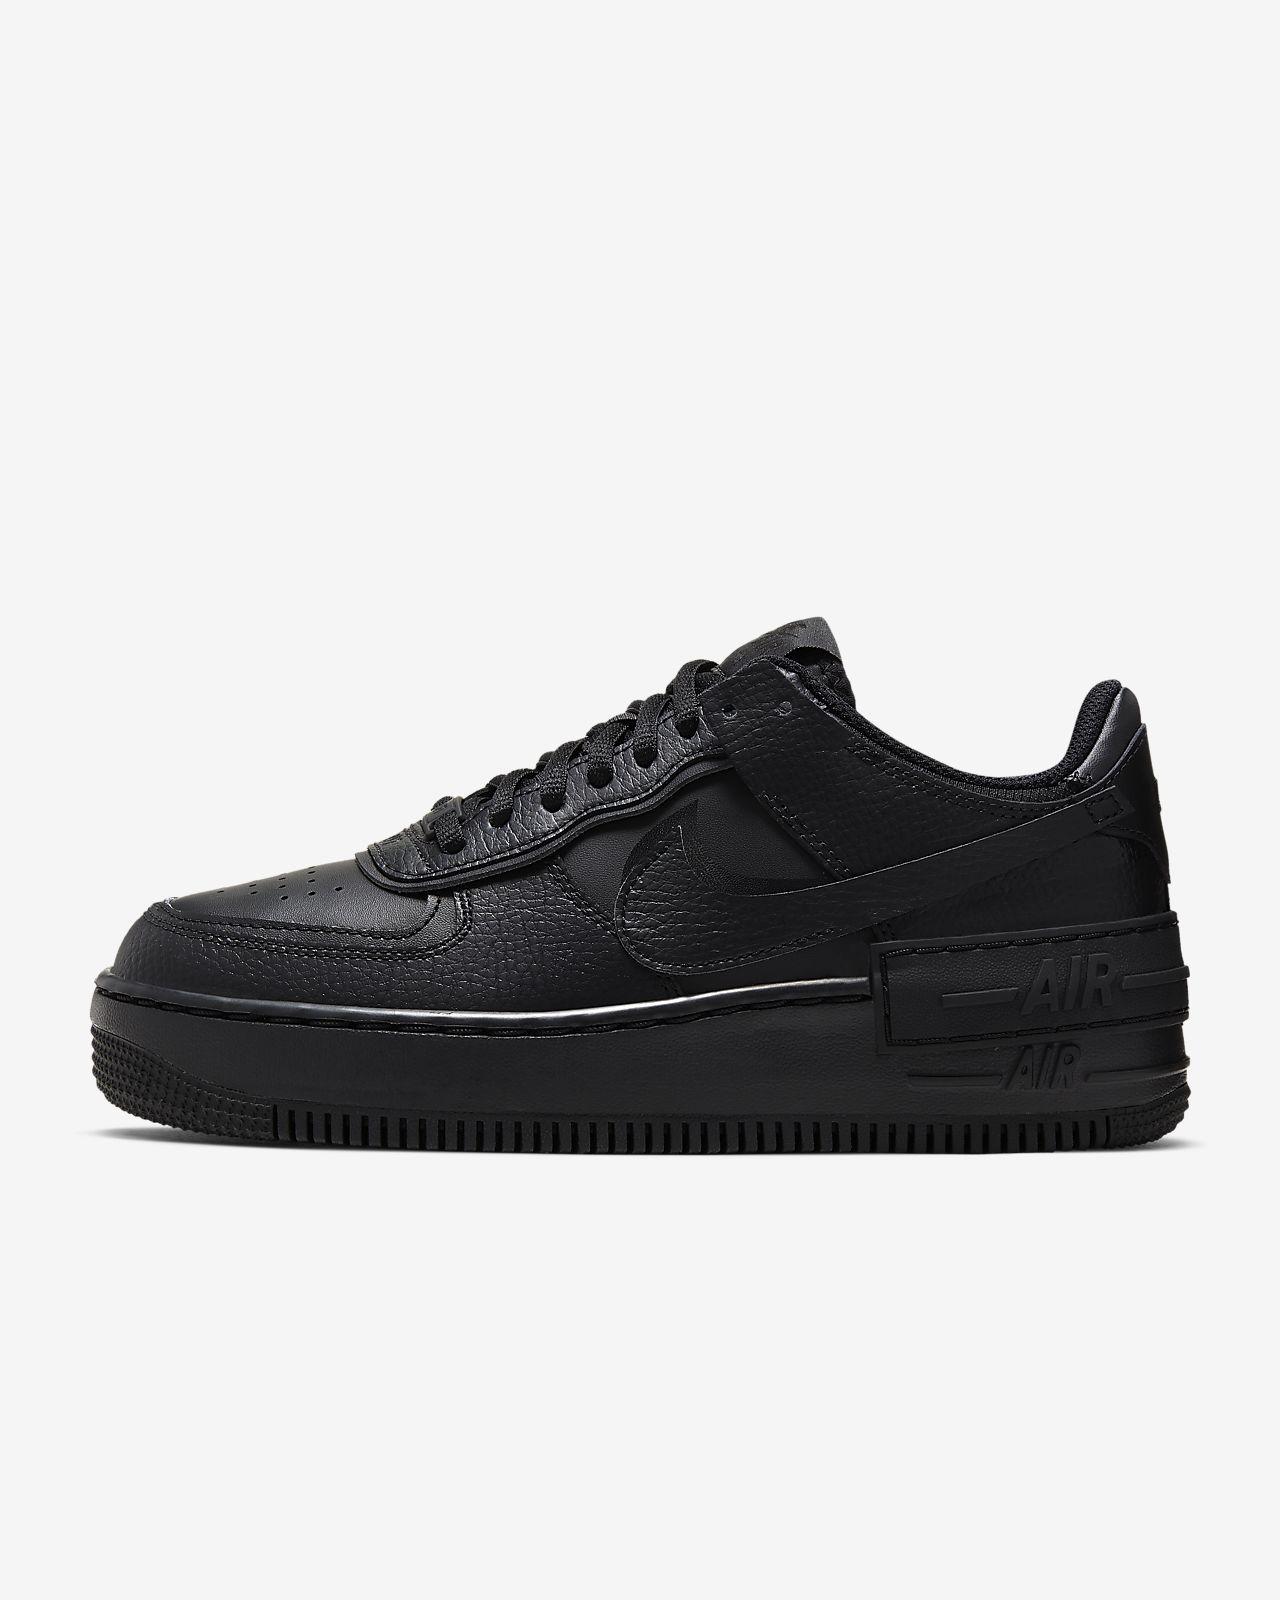 2nike sportswear scarpe uomo